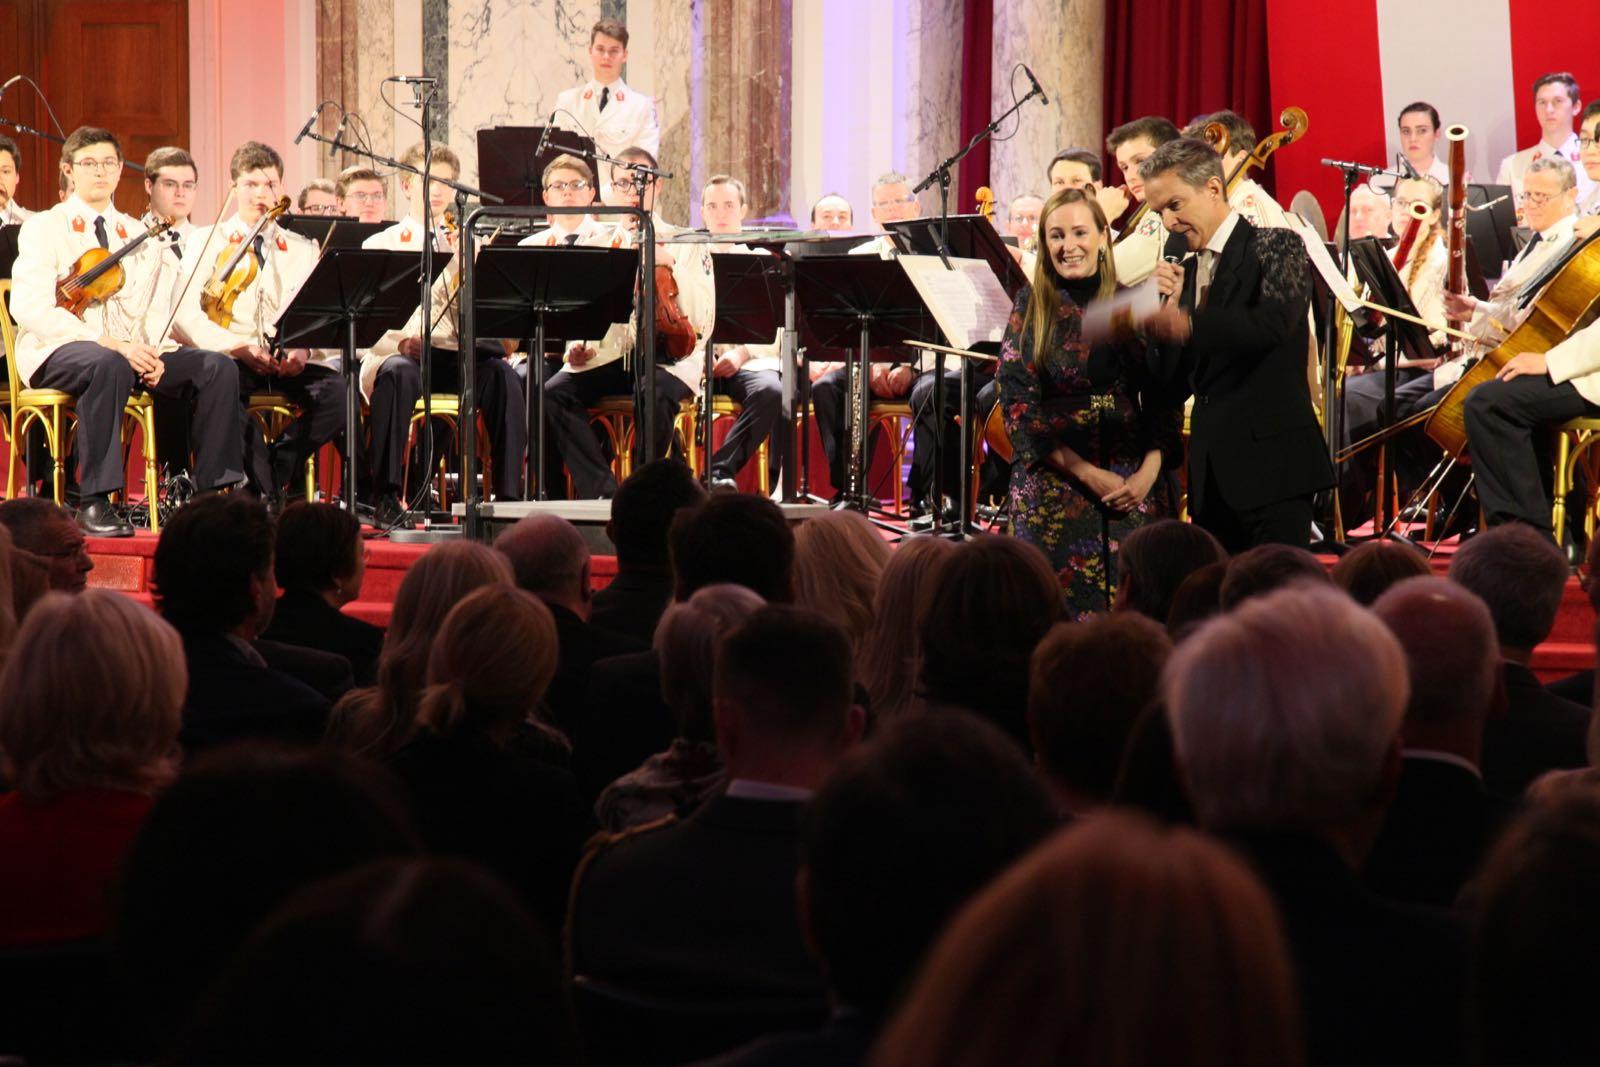 2019_03_14Gardemusik_Frühjahrskonzert_HBP_Hofburg - 44 of 177